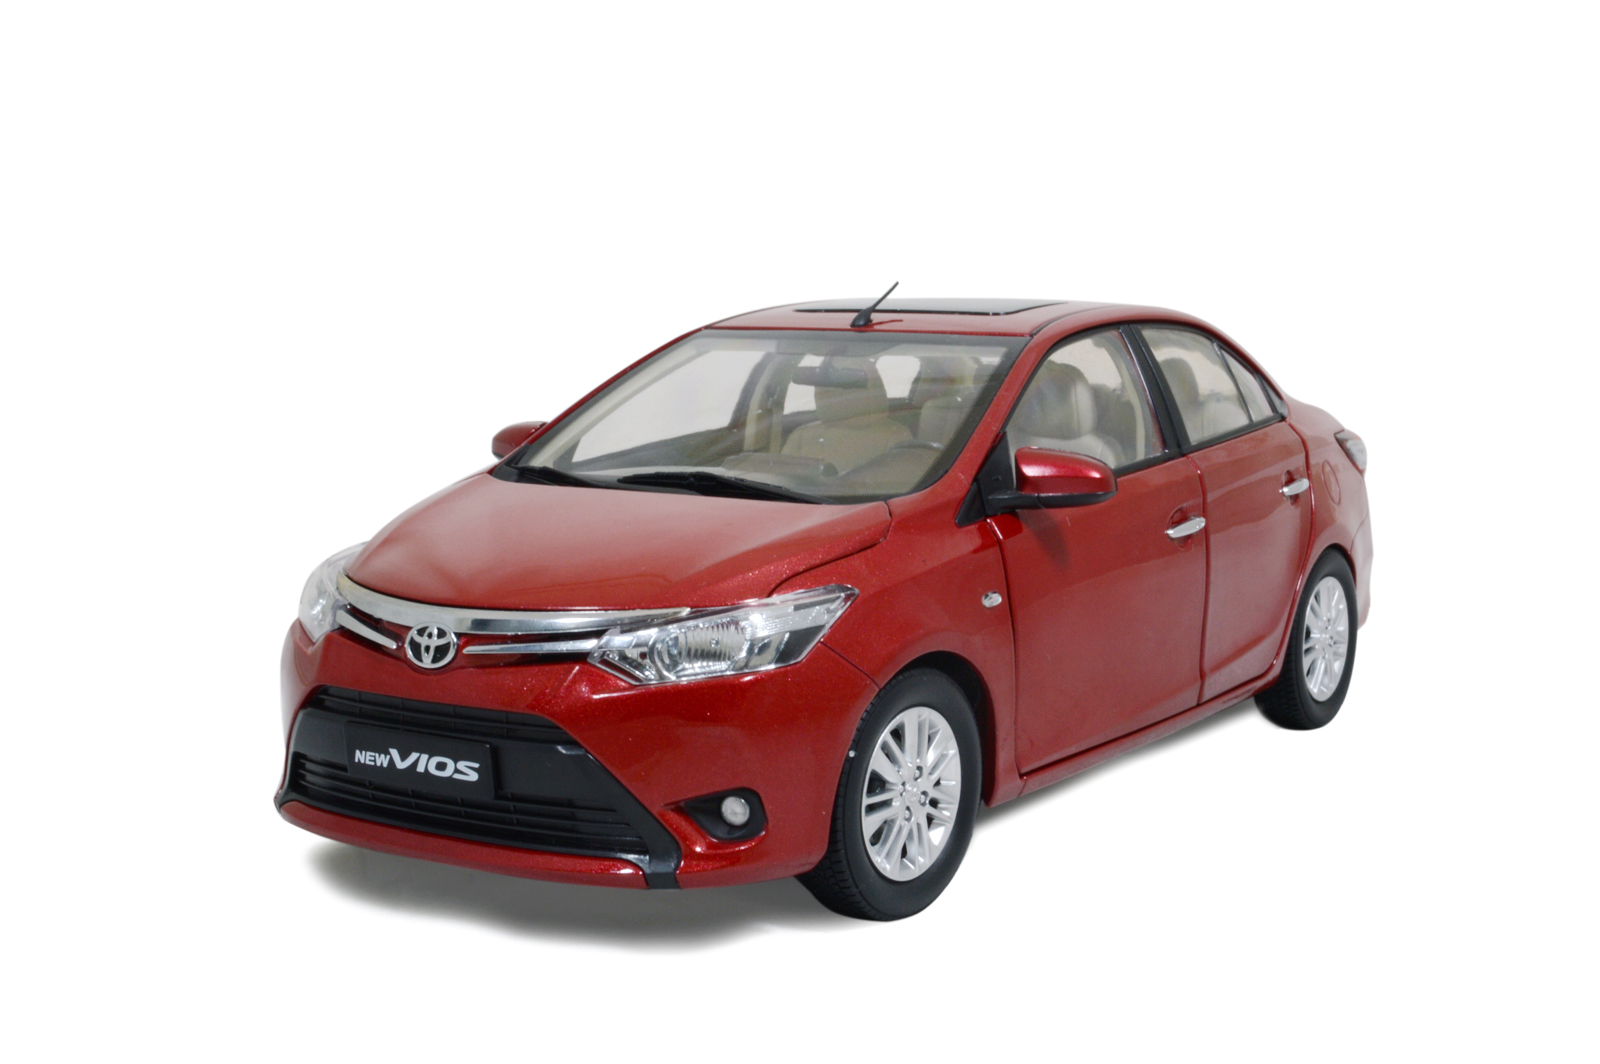 Toyota Vios 2014 1 18 Scale Diecast Model Car Wholesale